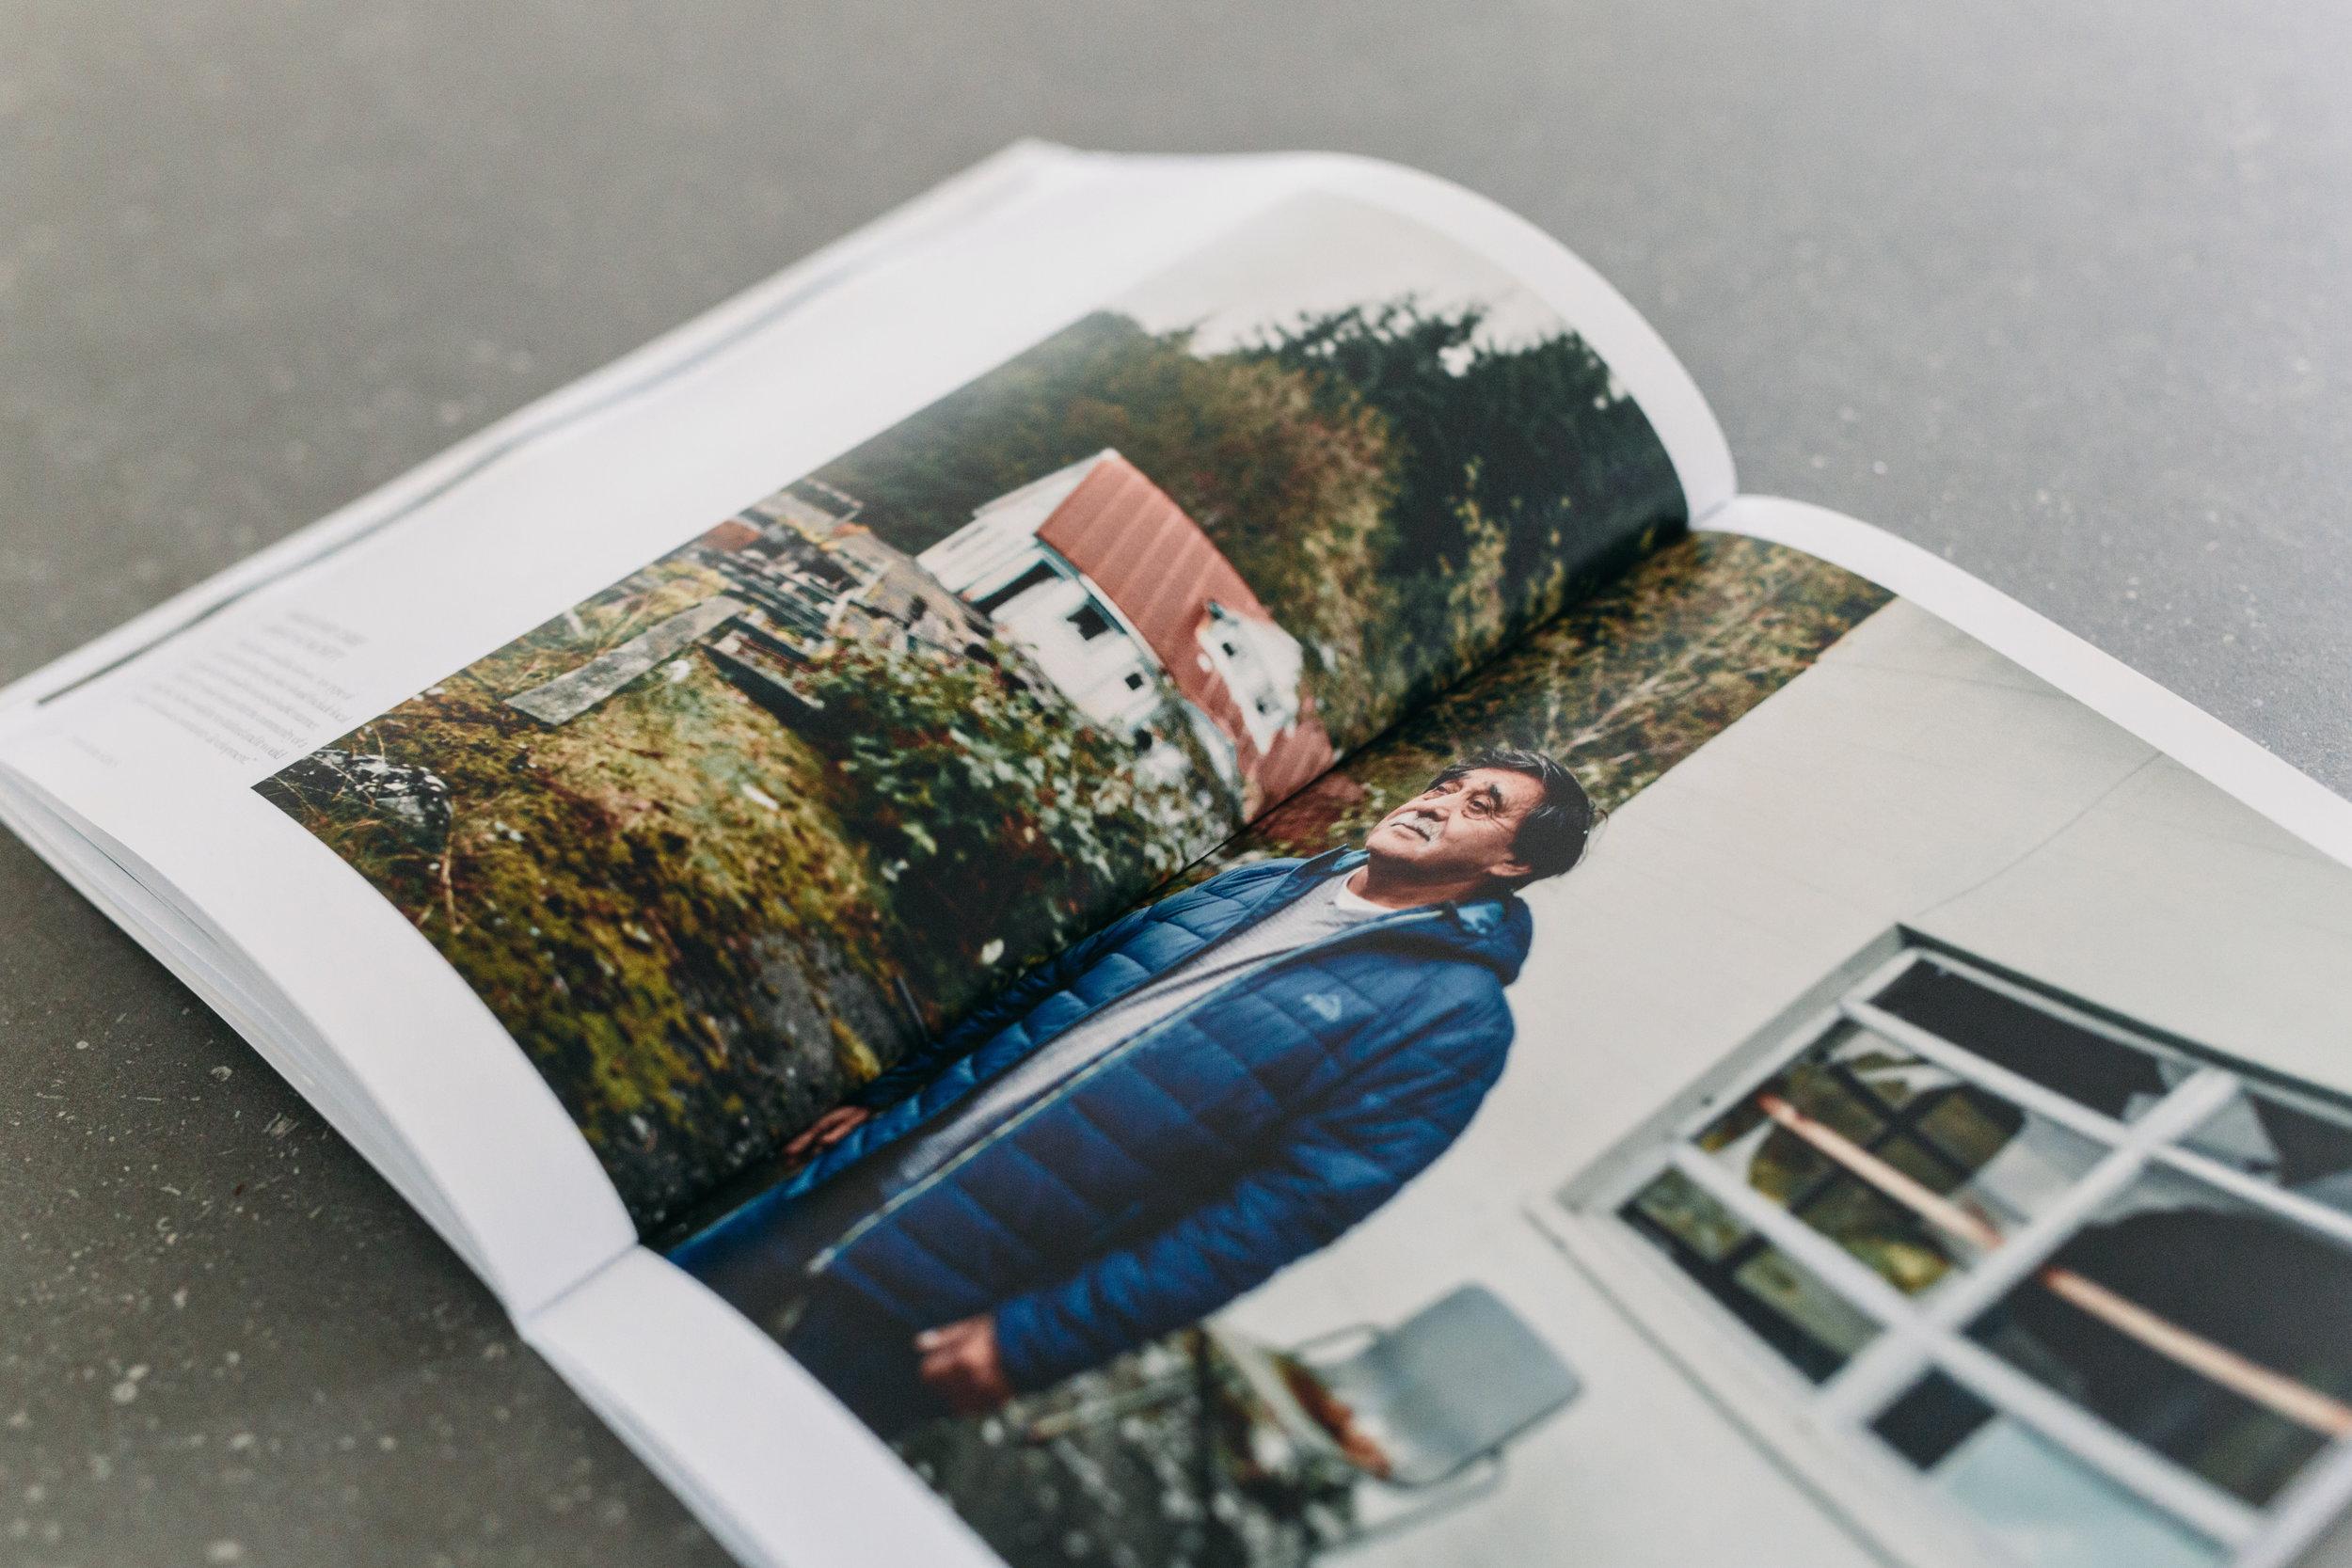 Promo-Books-Photos-TaylorRoades-0038.JPG